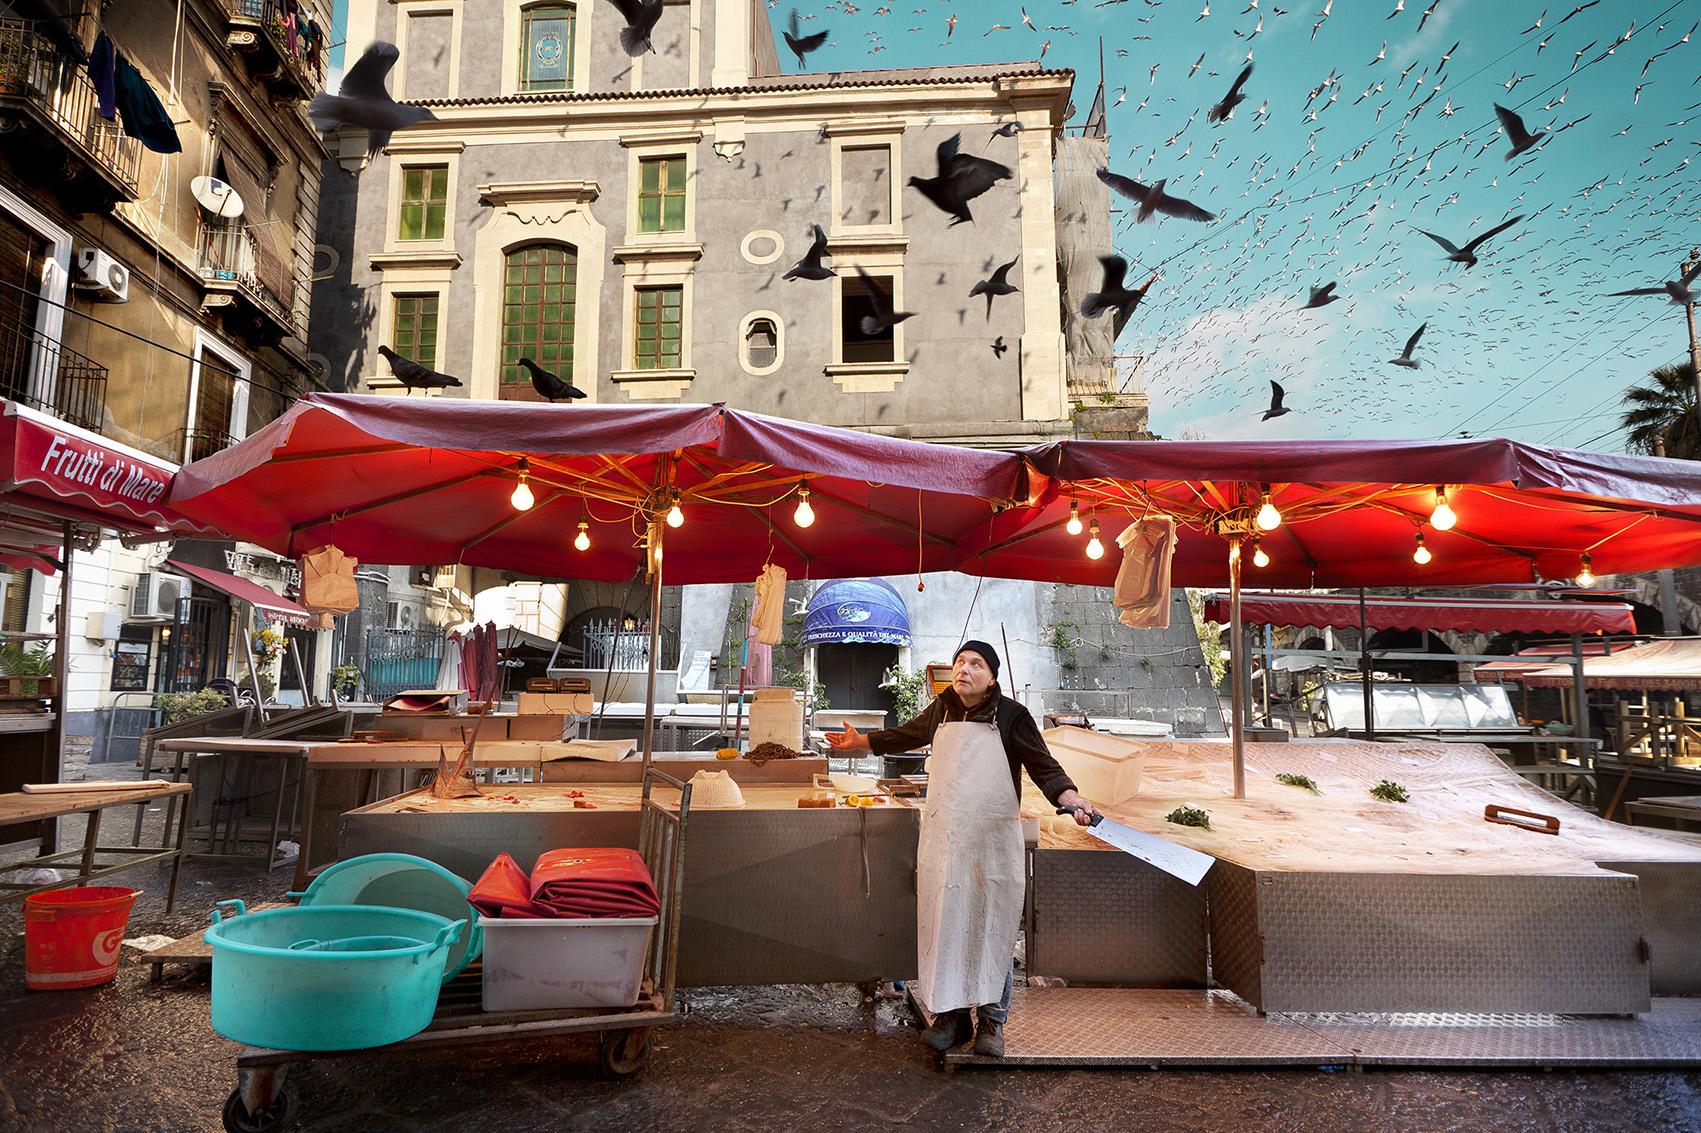 Orazio-Courtesy of Jacopo Leone-©VP for Etcetera Catania/Parigi-2012